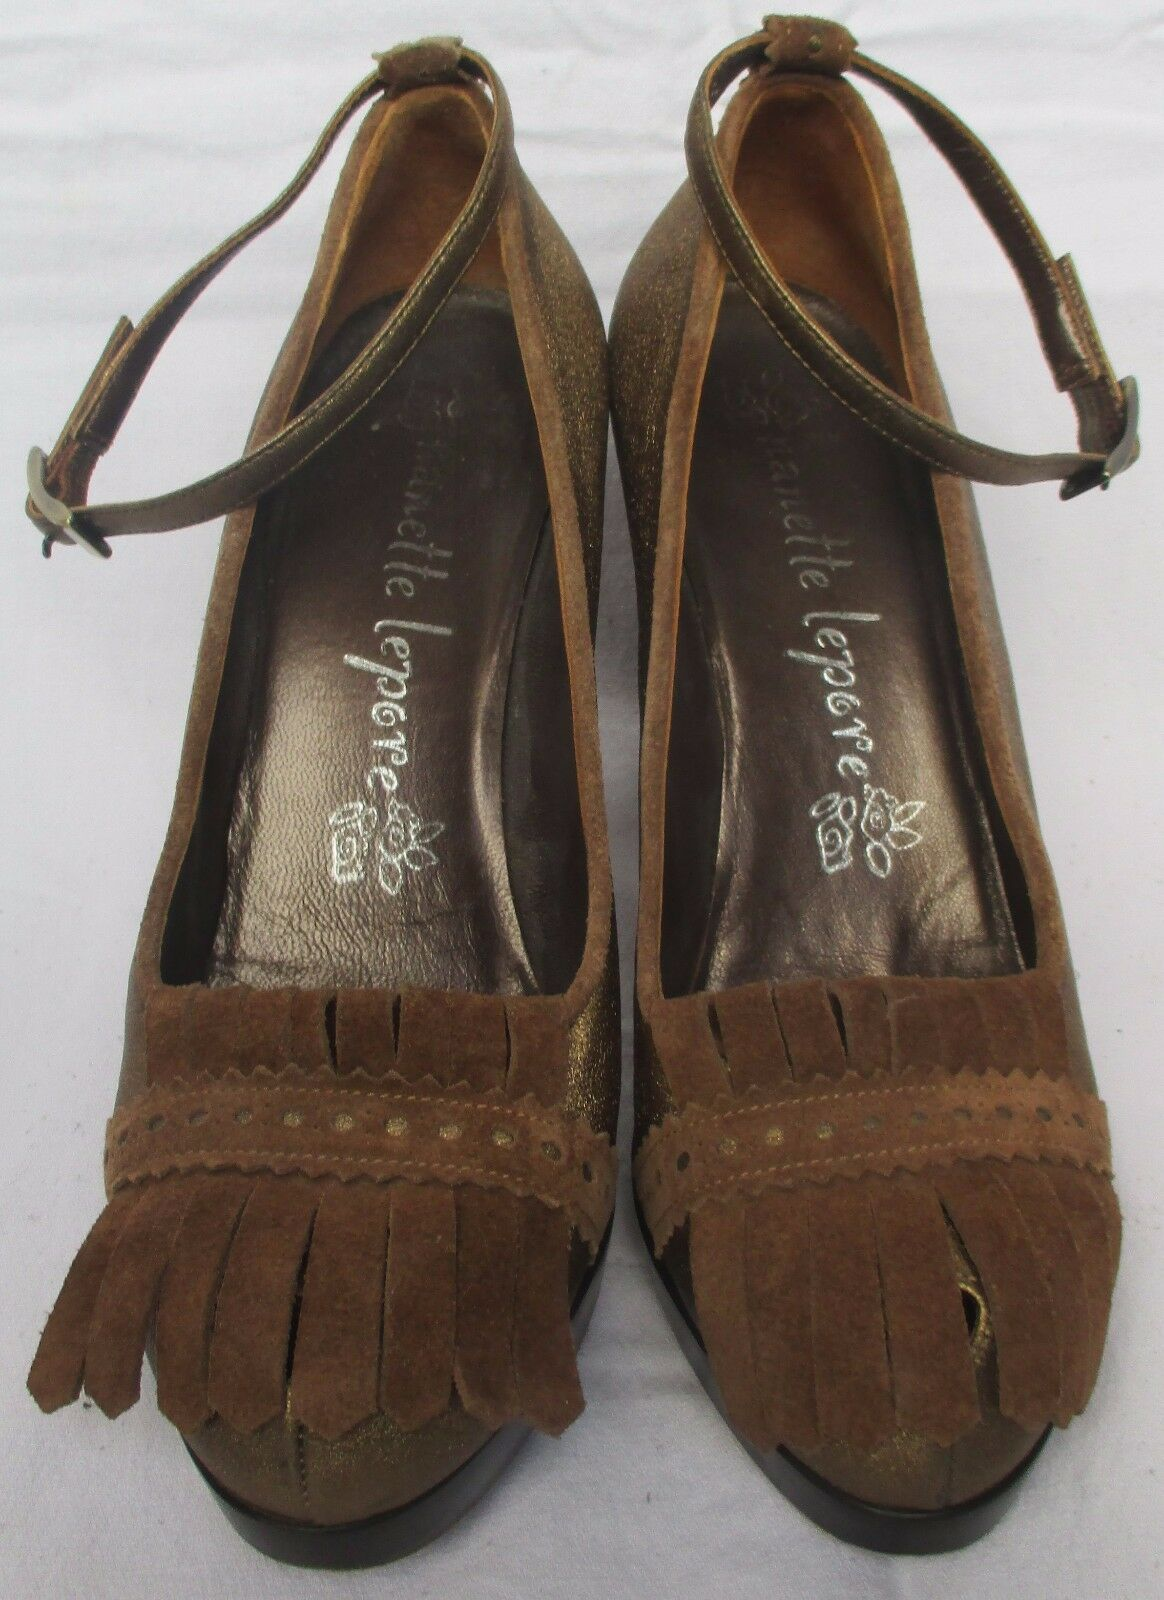 Nanette Lepore schuhe Bronze Leather Ankle Strap Platform schuhe Lepore Größe 8 B fb24f8